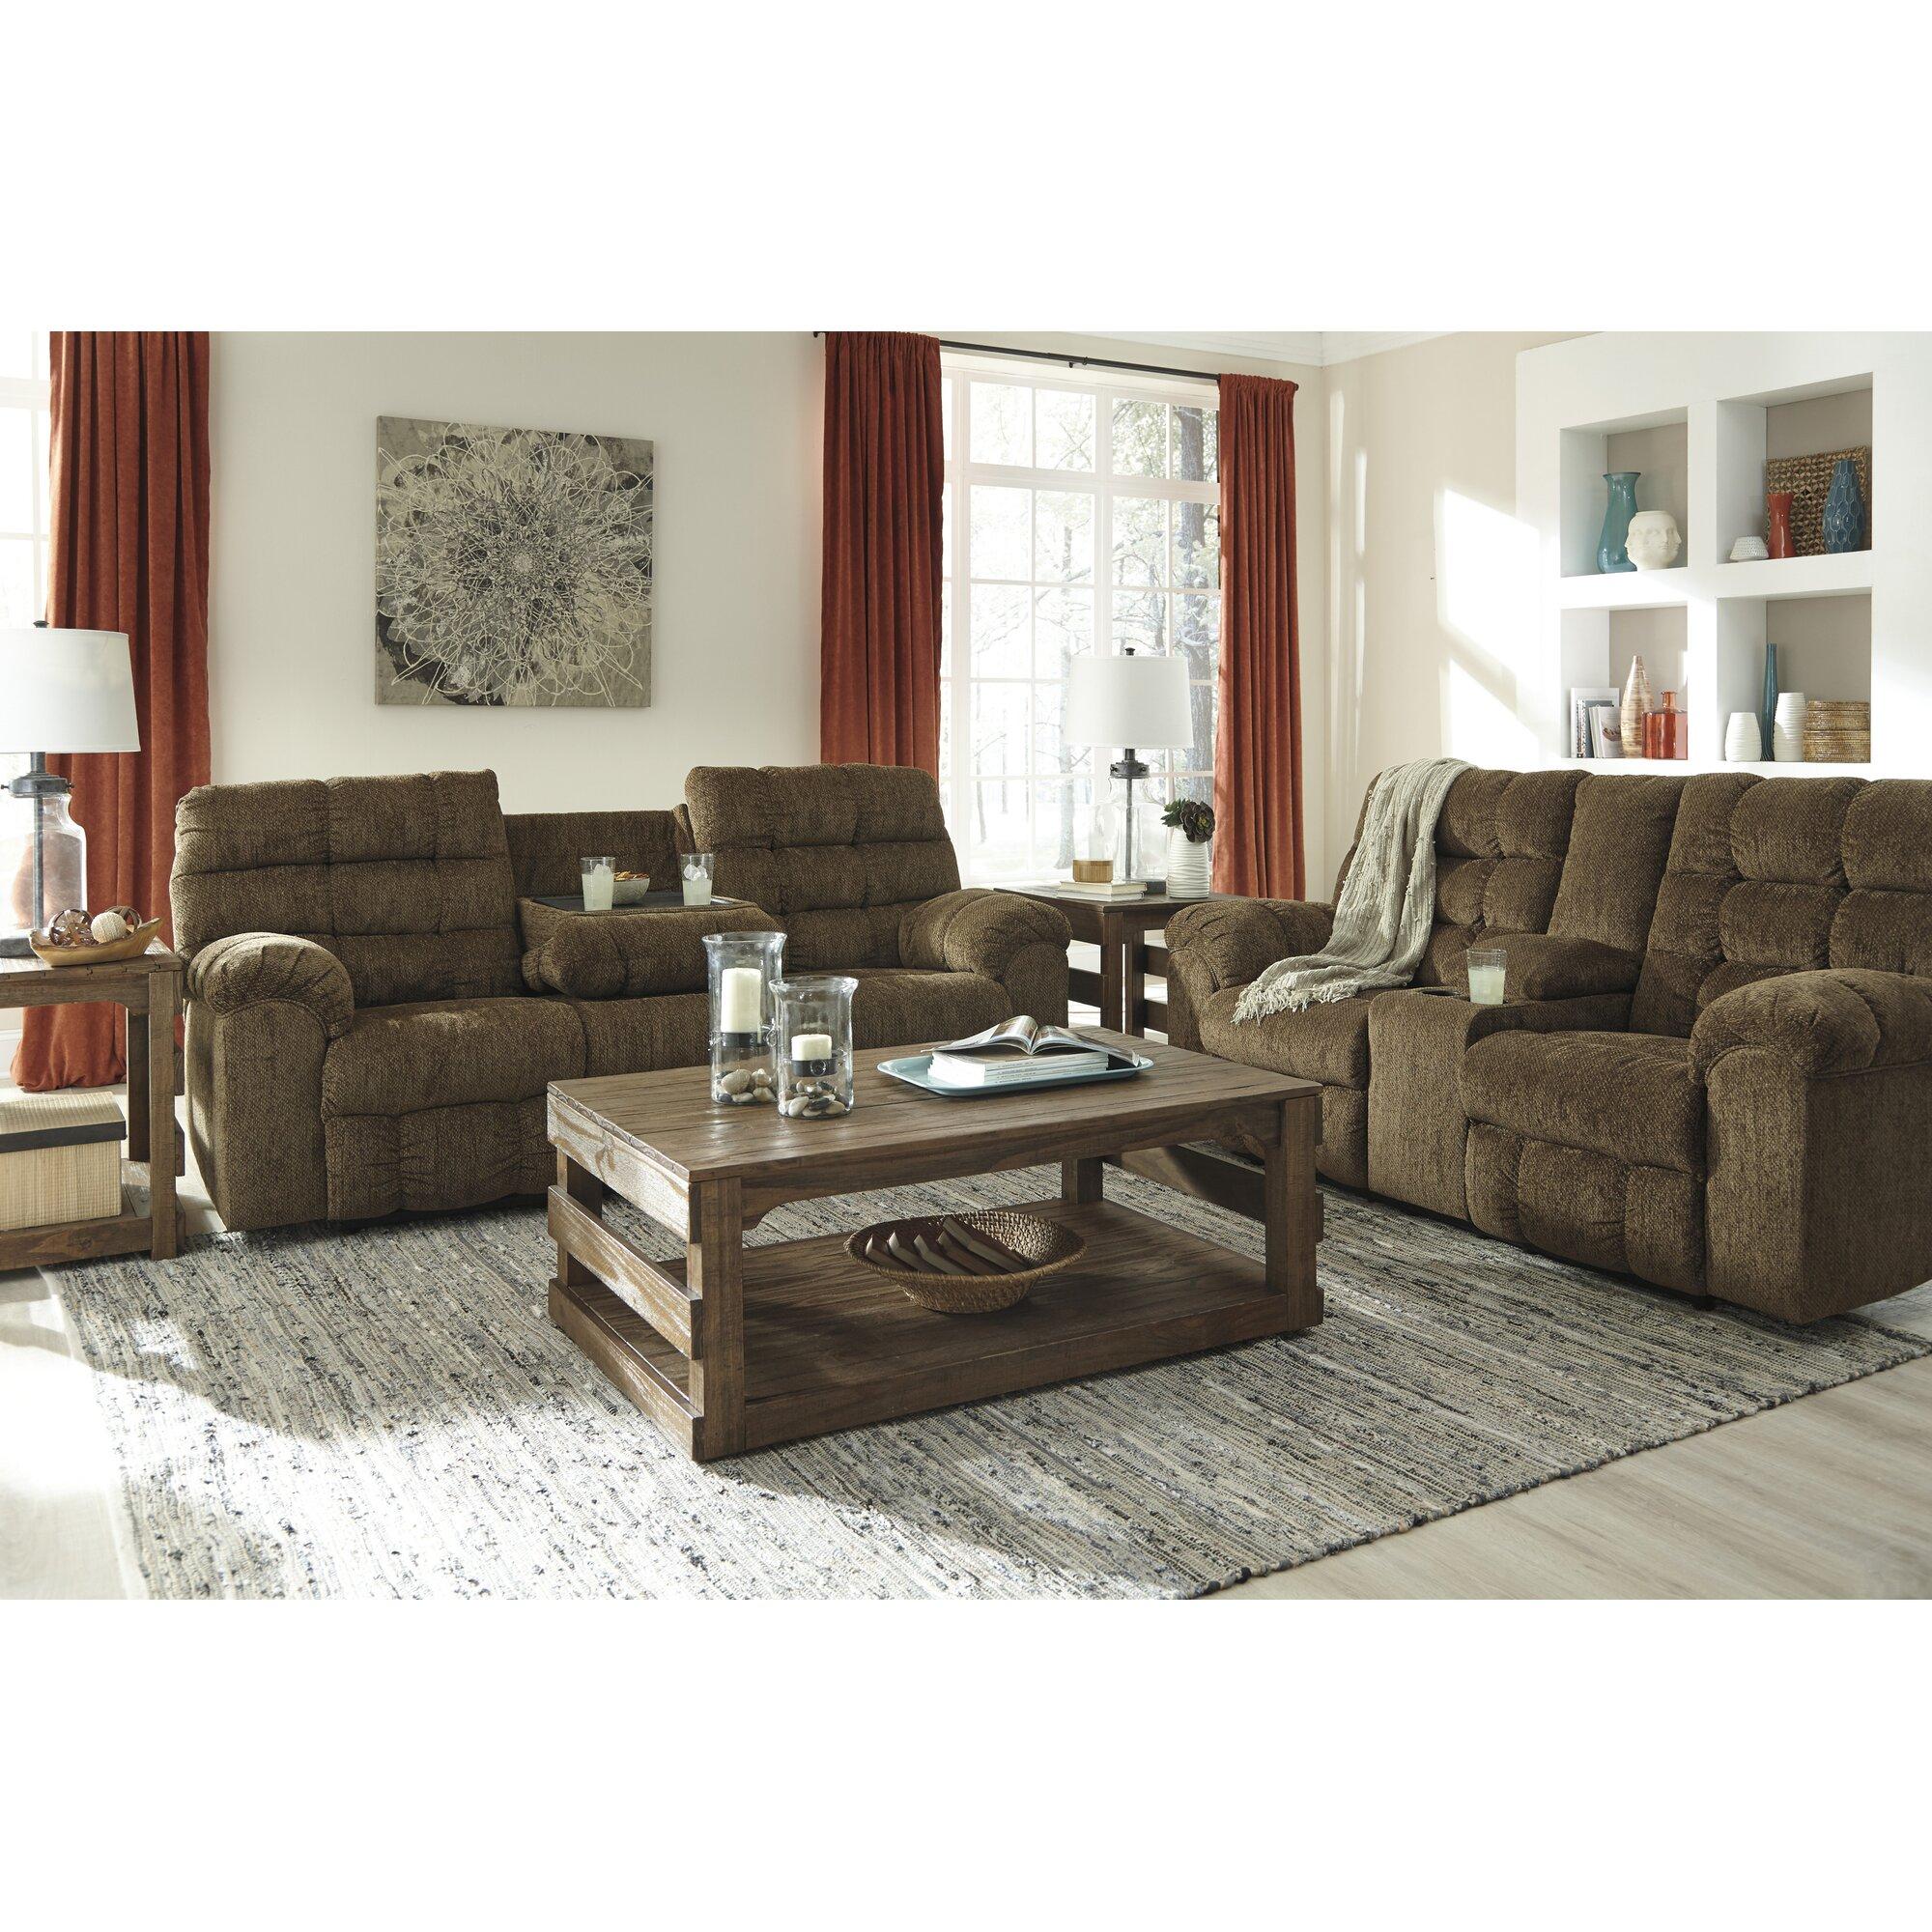 Loon peak atayurt living room set reviews for Wg r living room sets